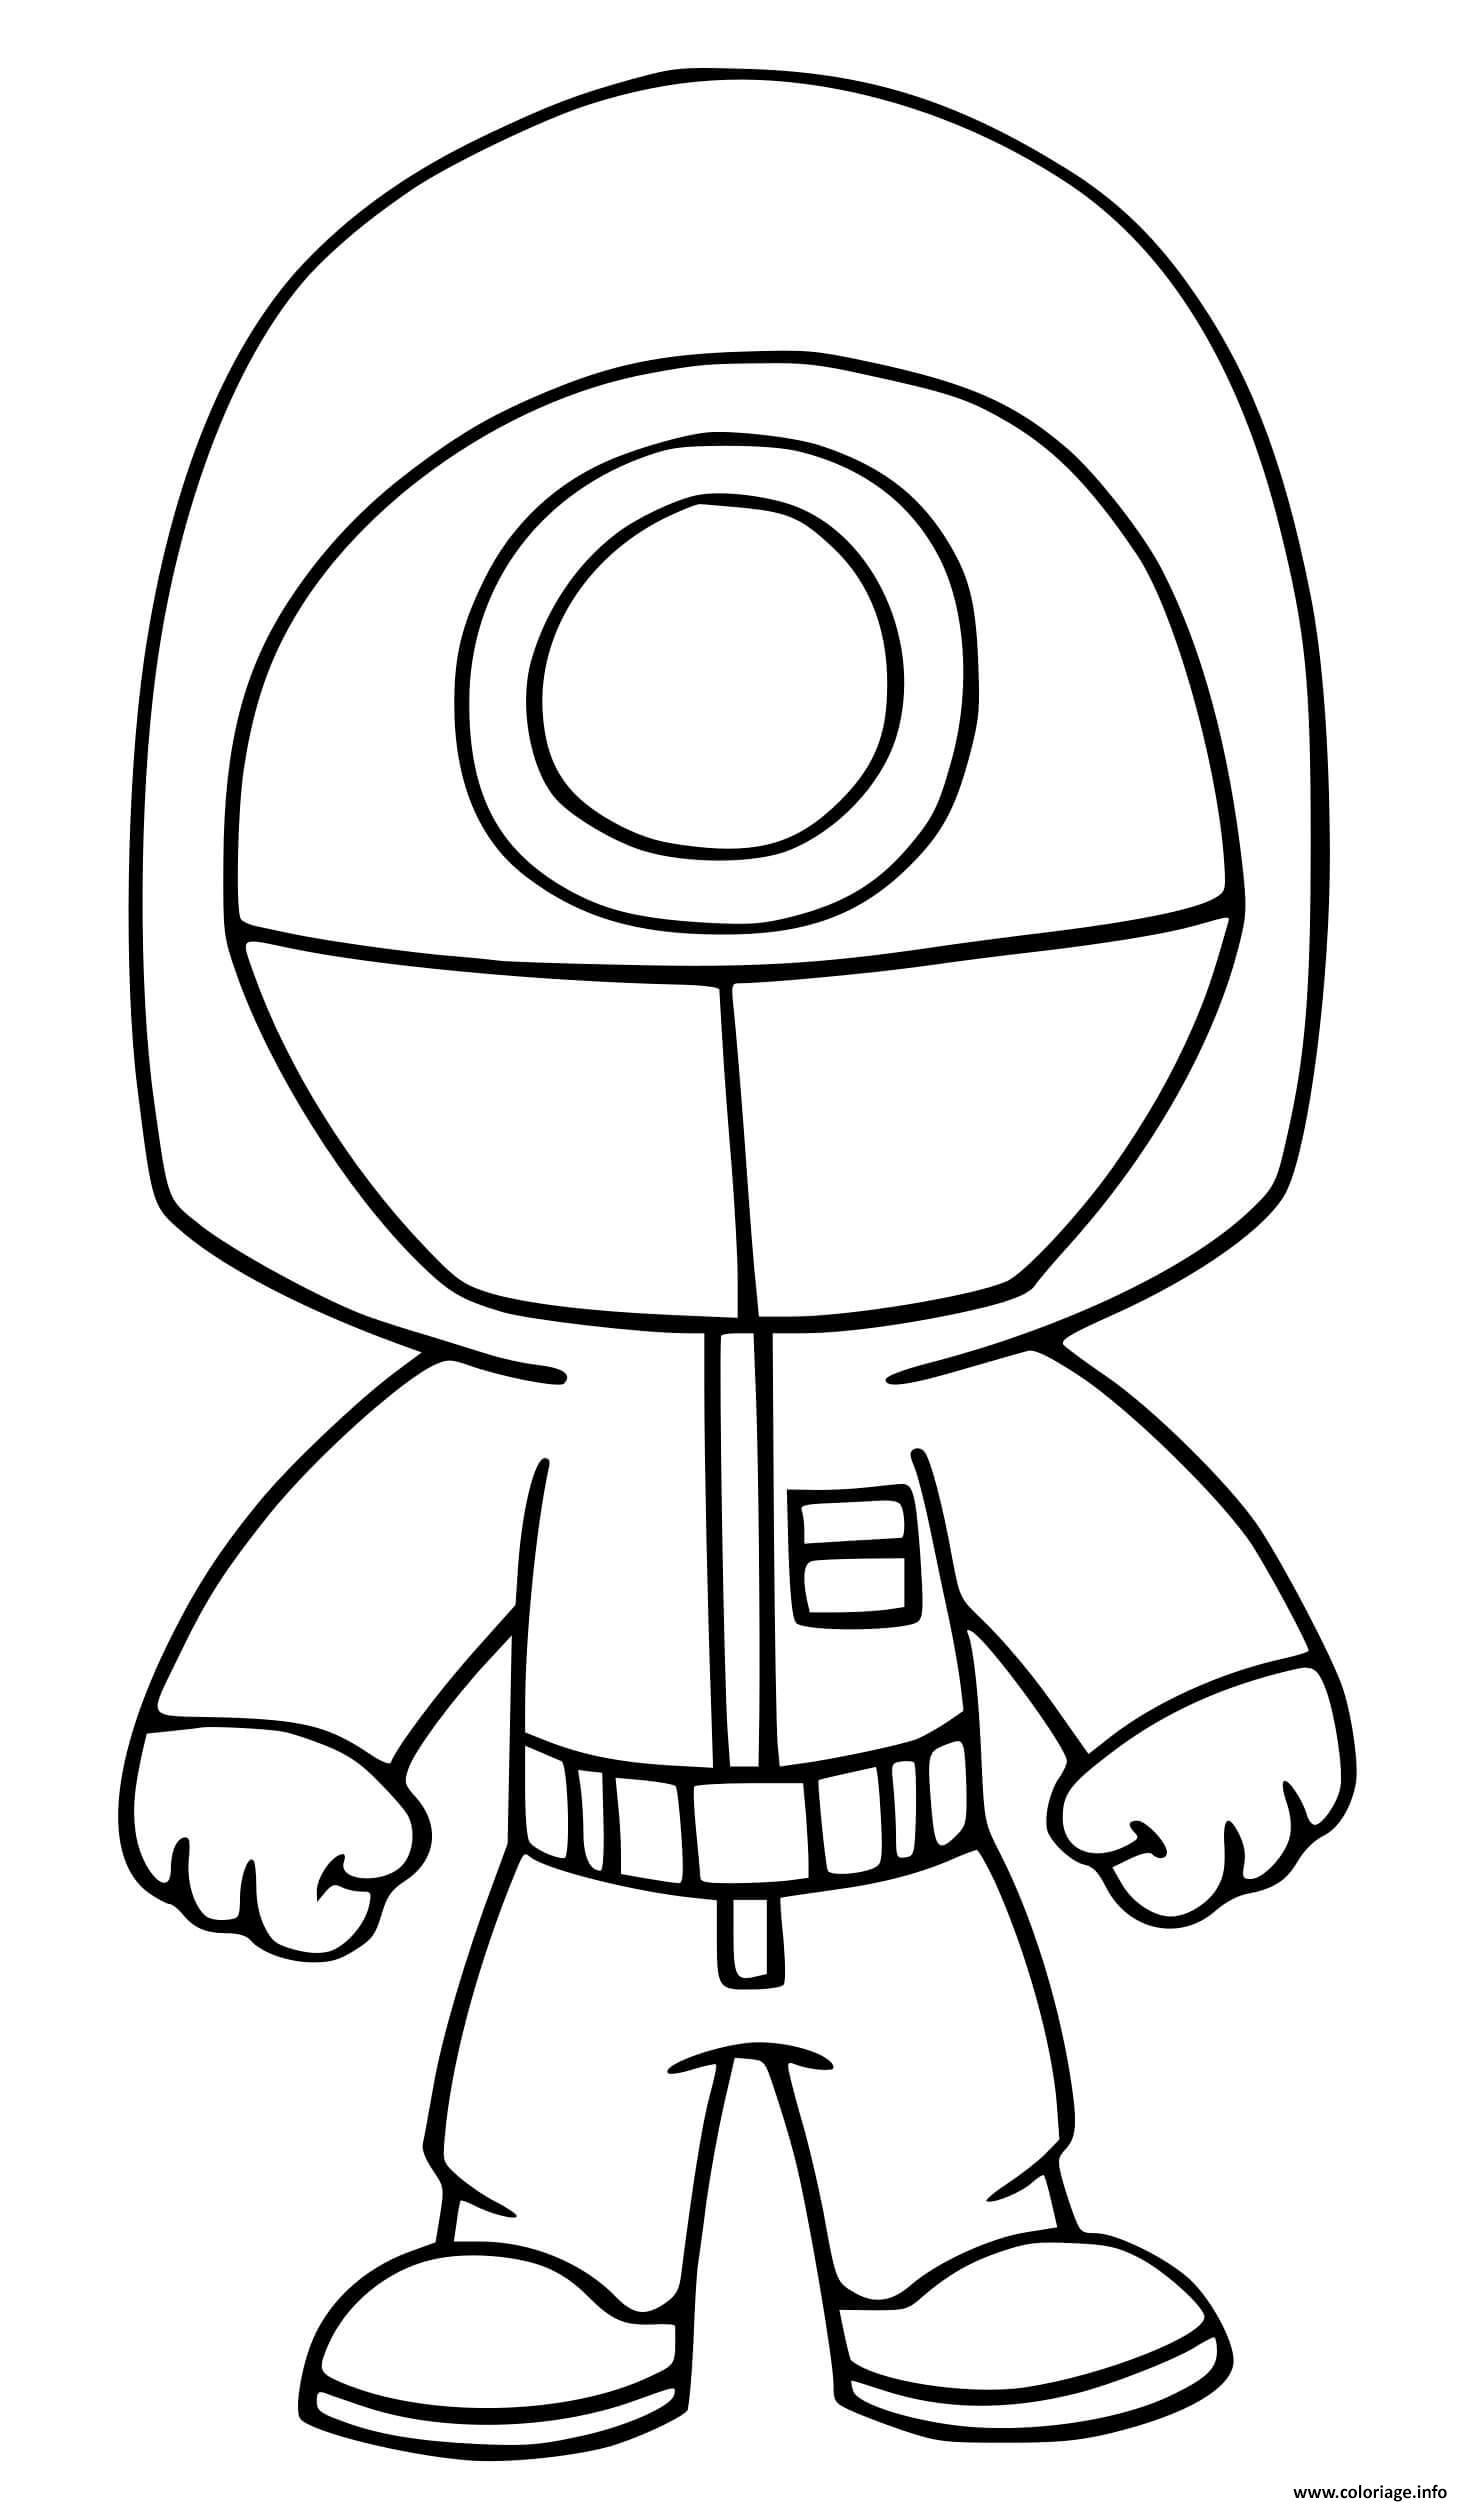 Dessin squid game worker game circle Coloriage Gratuit à Imprimer